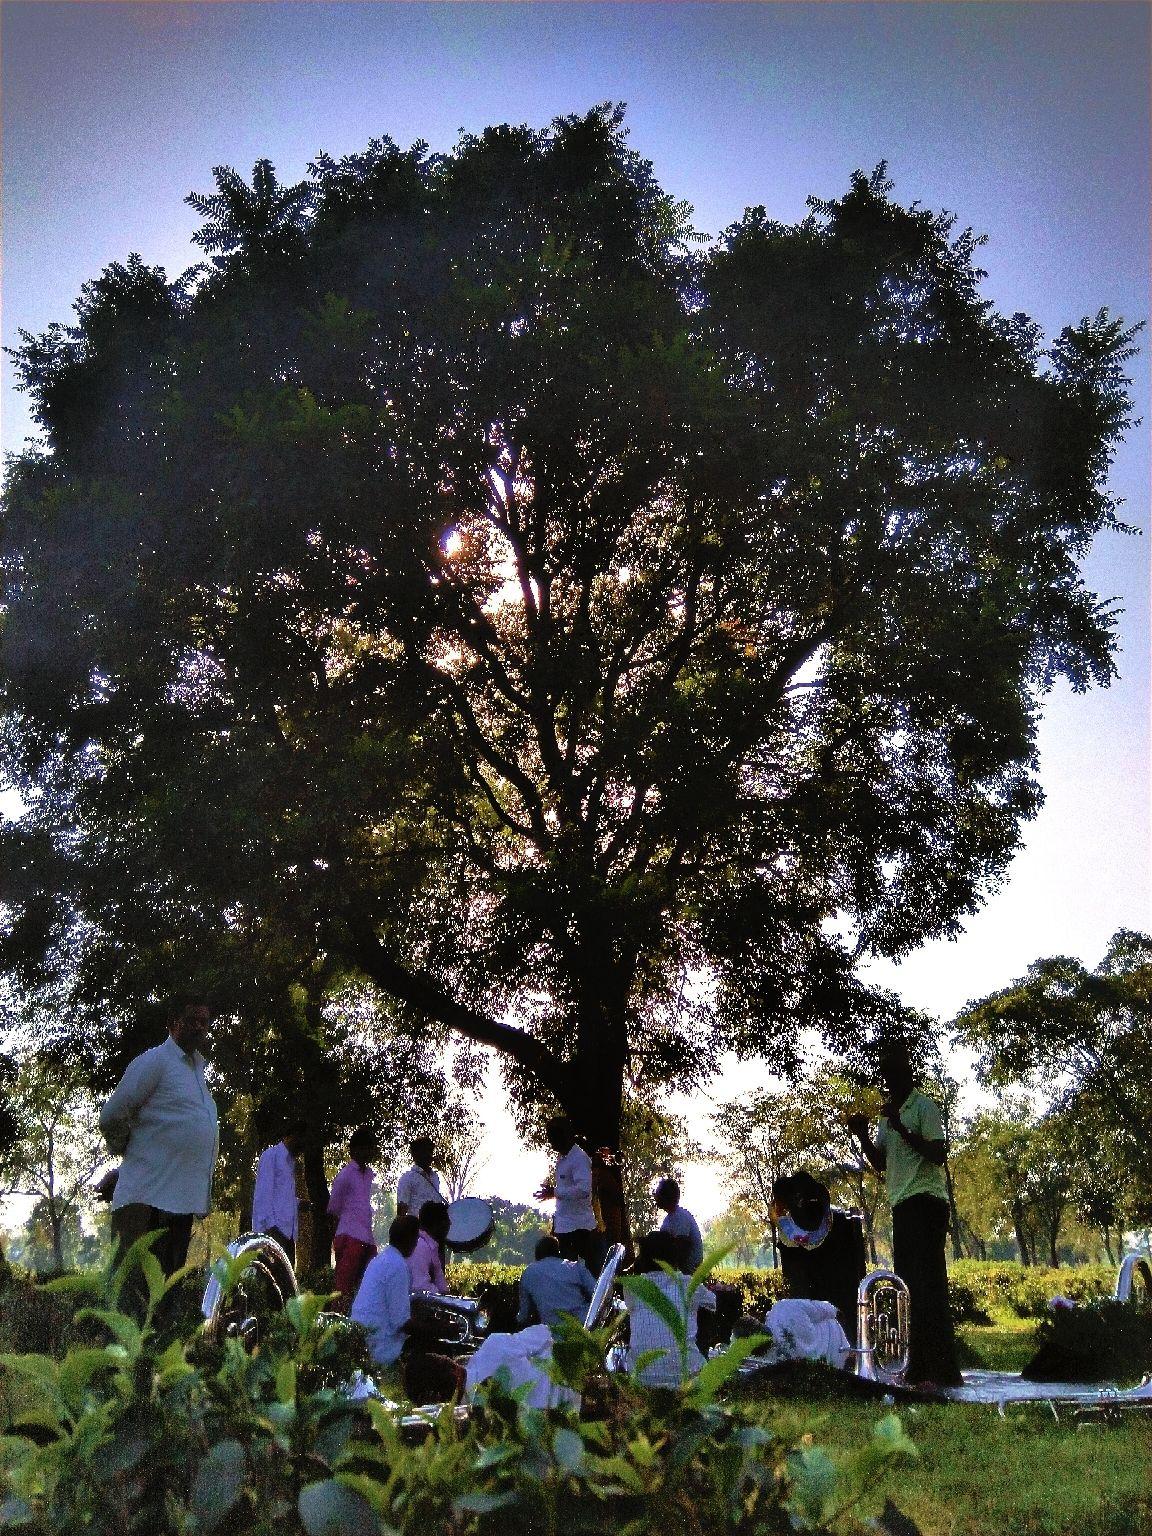 Photo of Prem Nagar By budwhyy